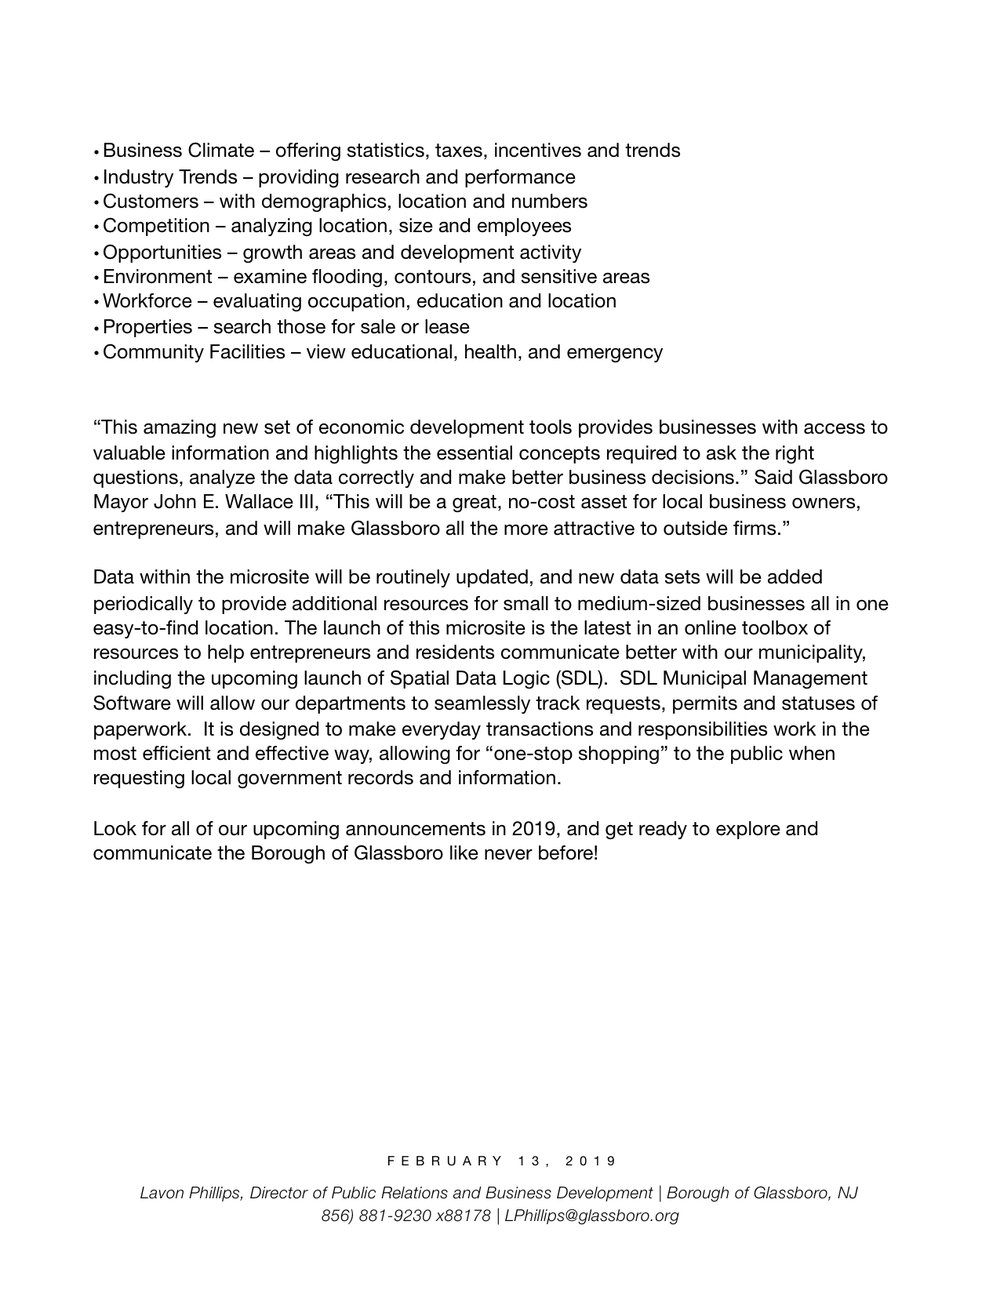 Glassboro NJ Press Release for Localintel page 2.jpeg